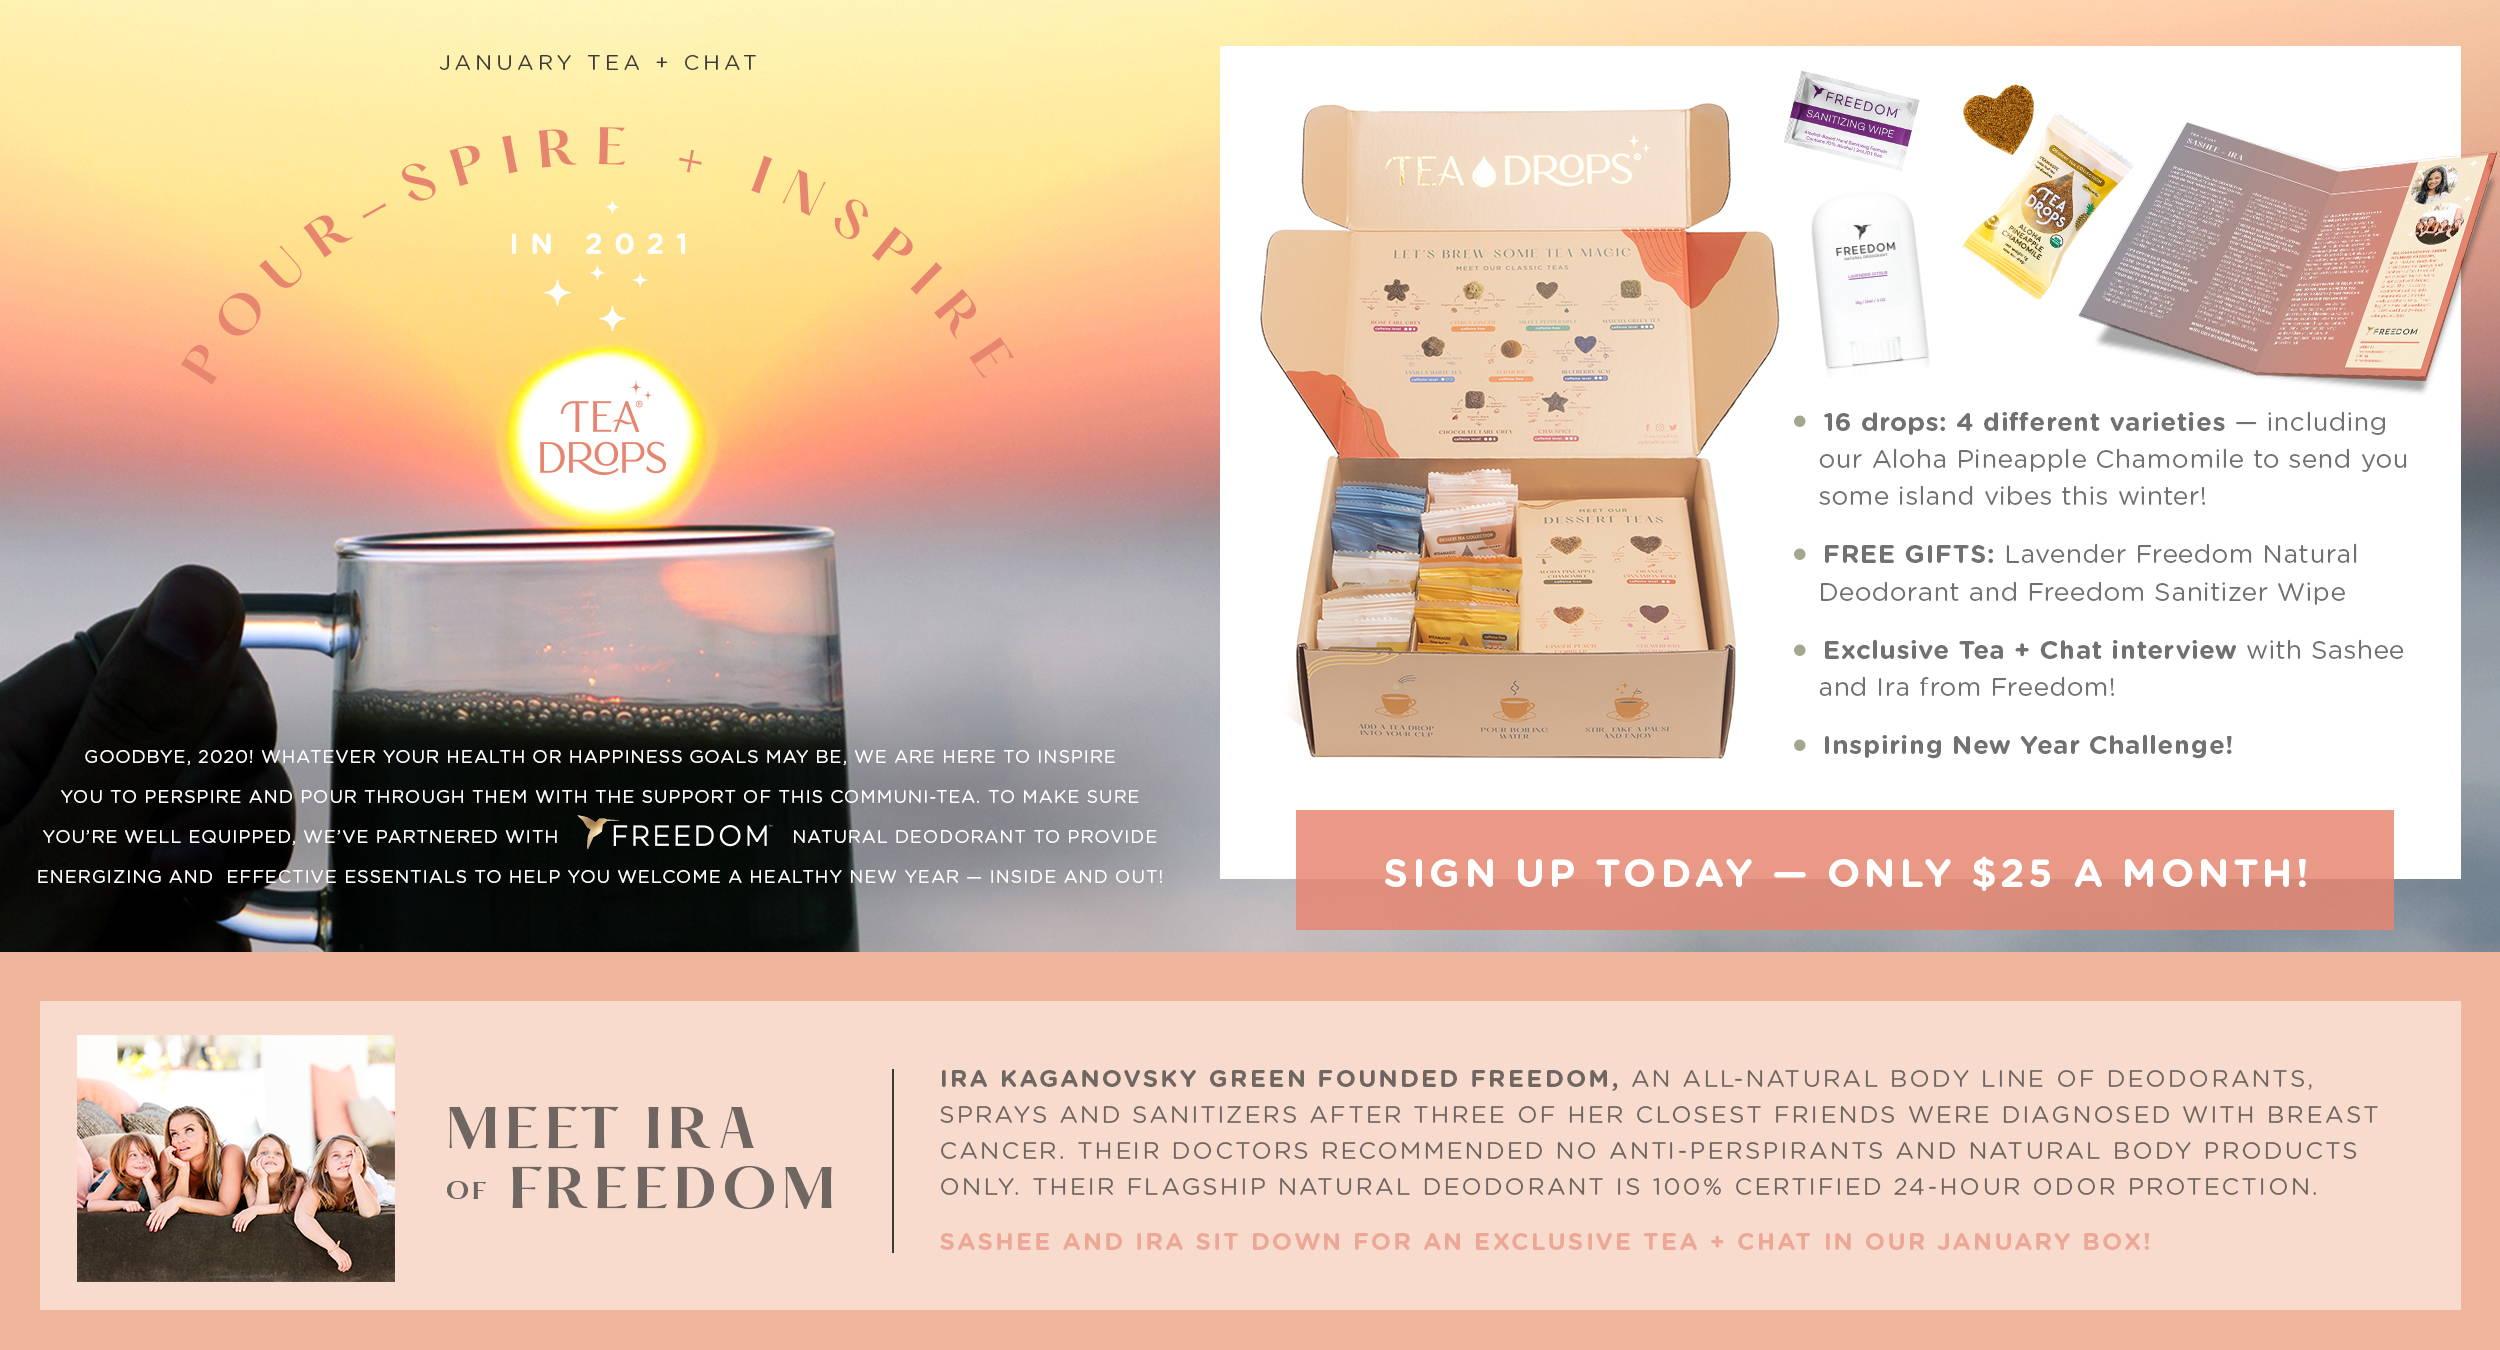 January Tea + Chat Subscription Box